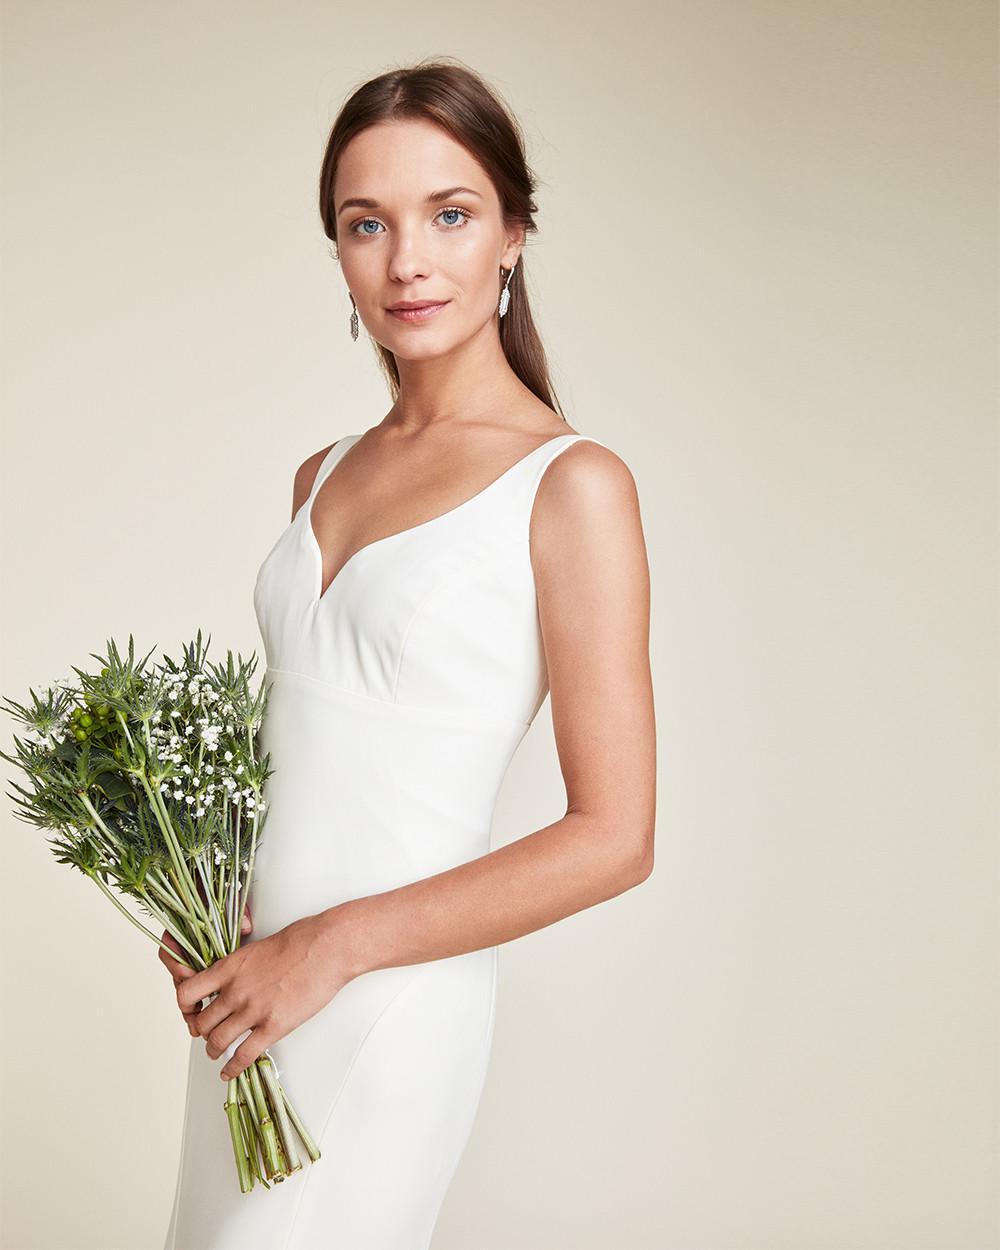 Lyst - Nicole Miller Abigail Bridal Gown in White